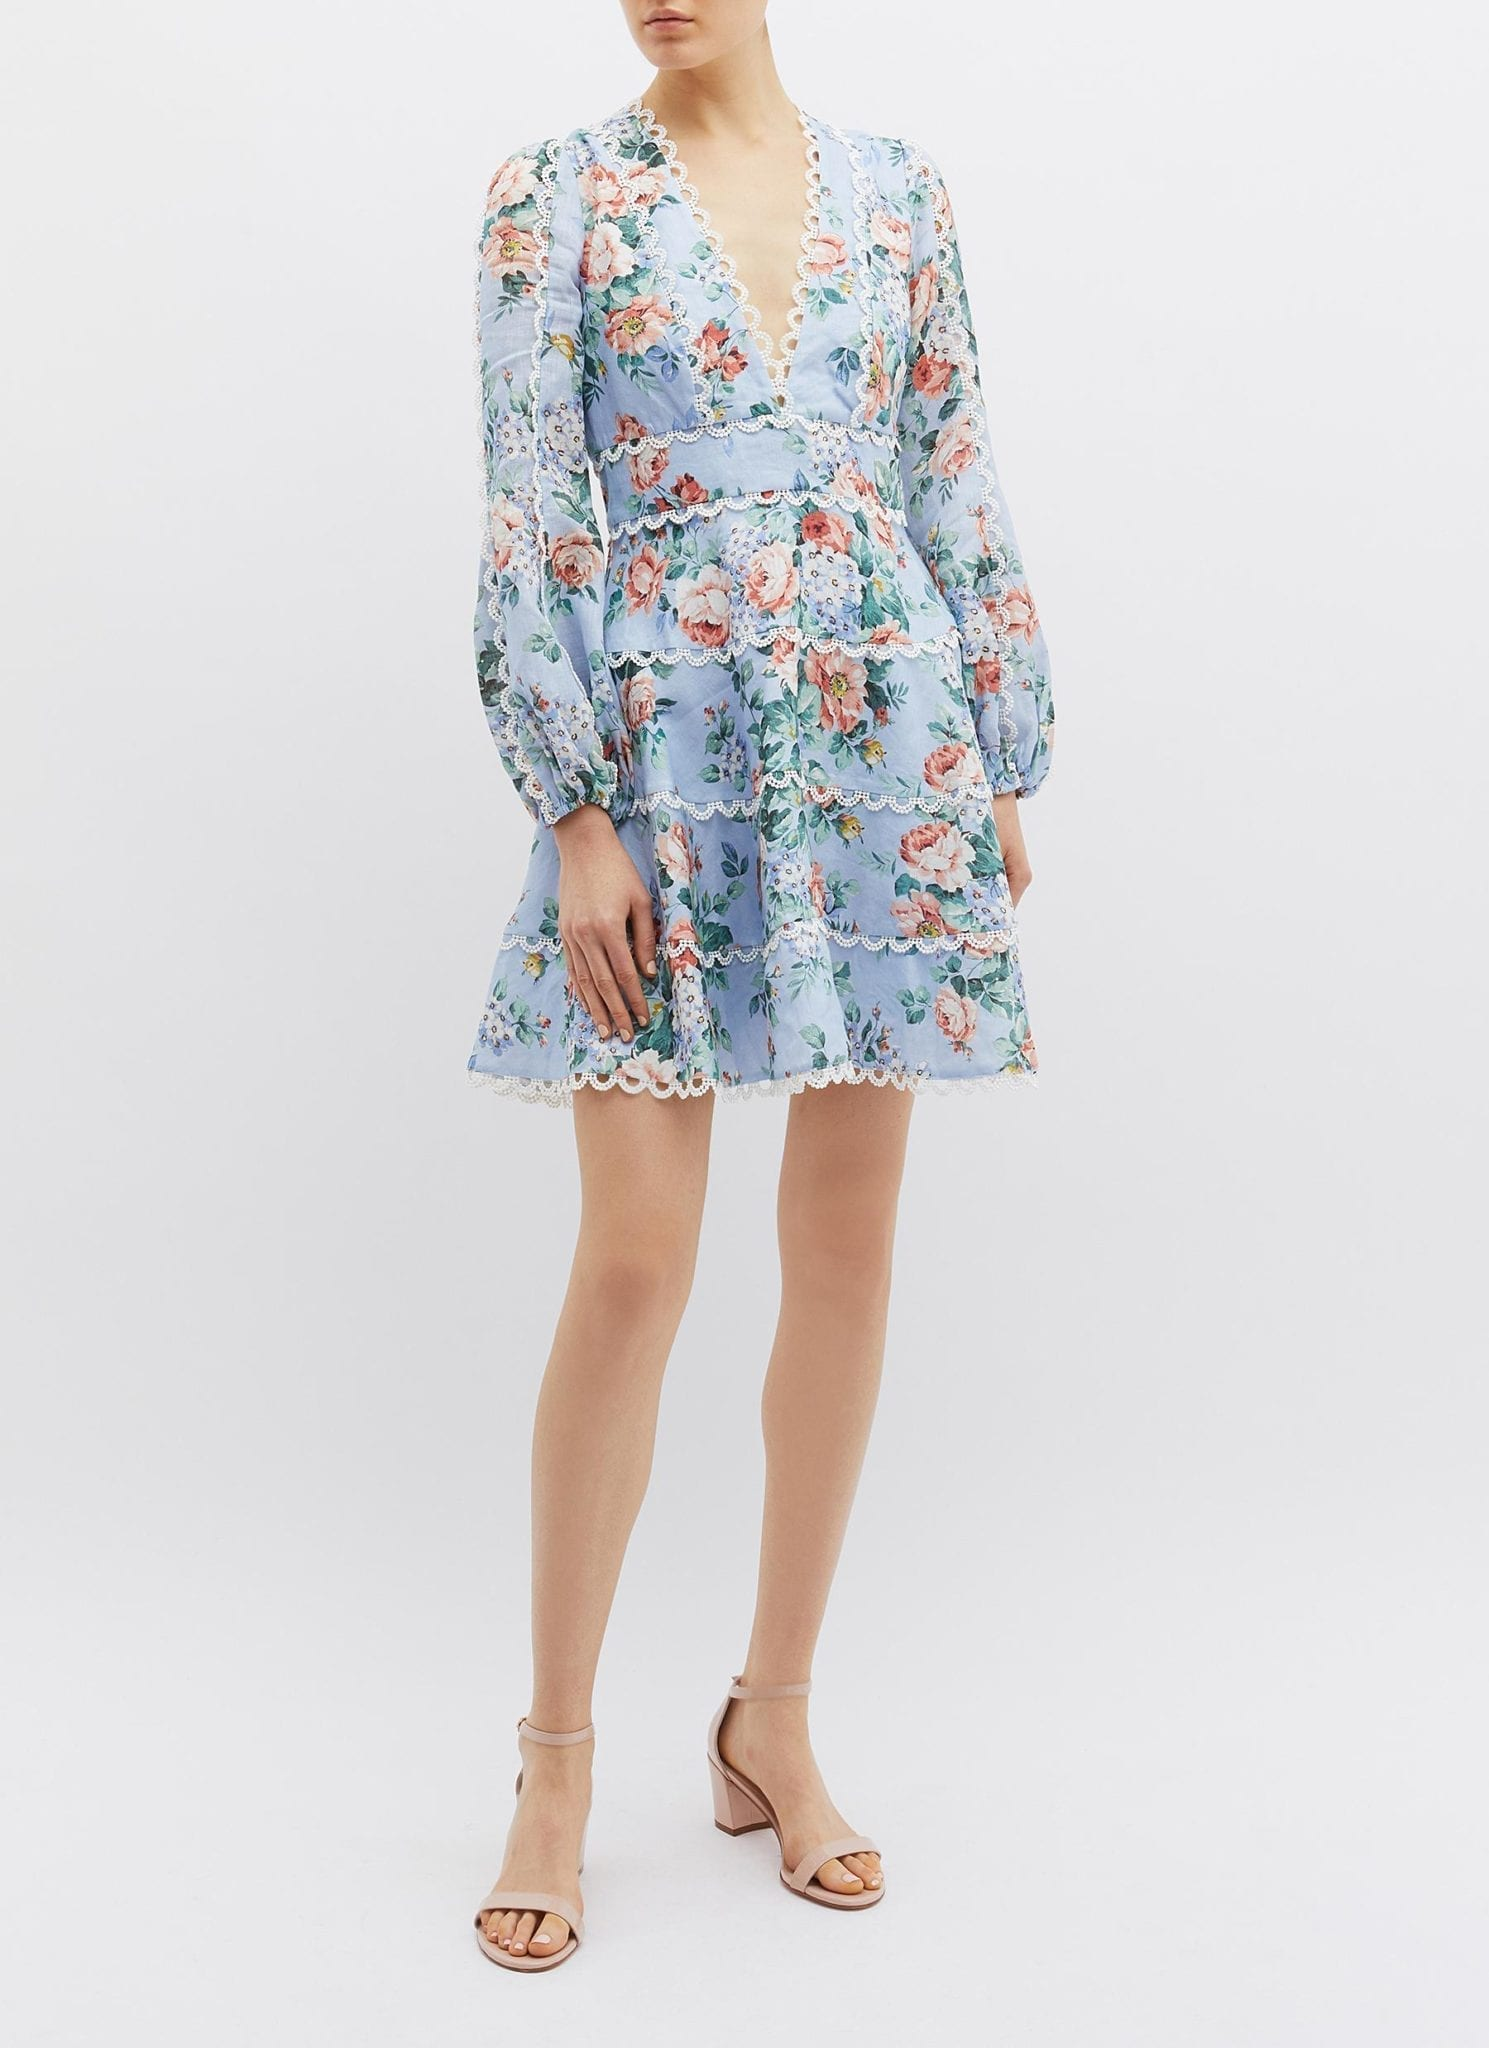 ZIMMERMANN 'Bowie' Scalloped Trim Linen Light Blue / Floral Printed Dress